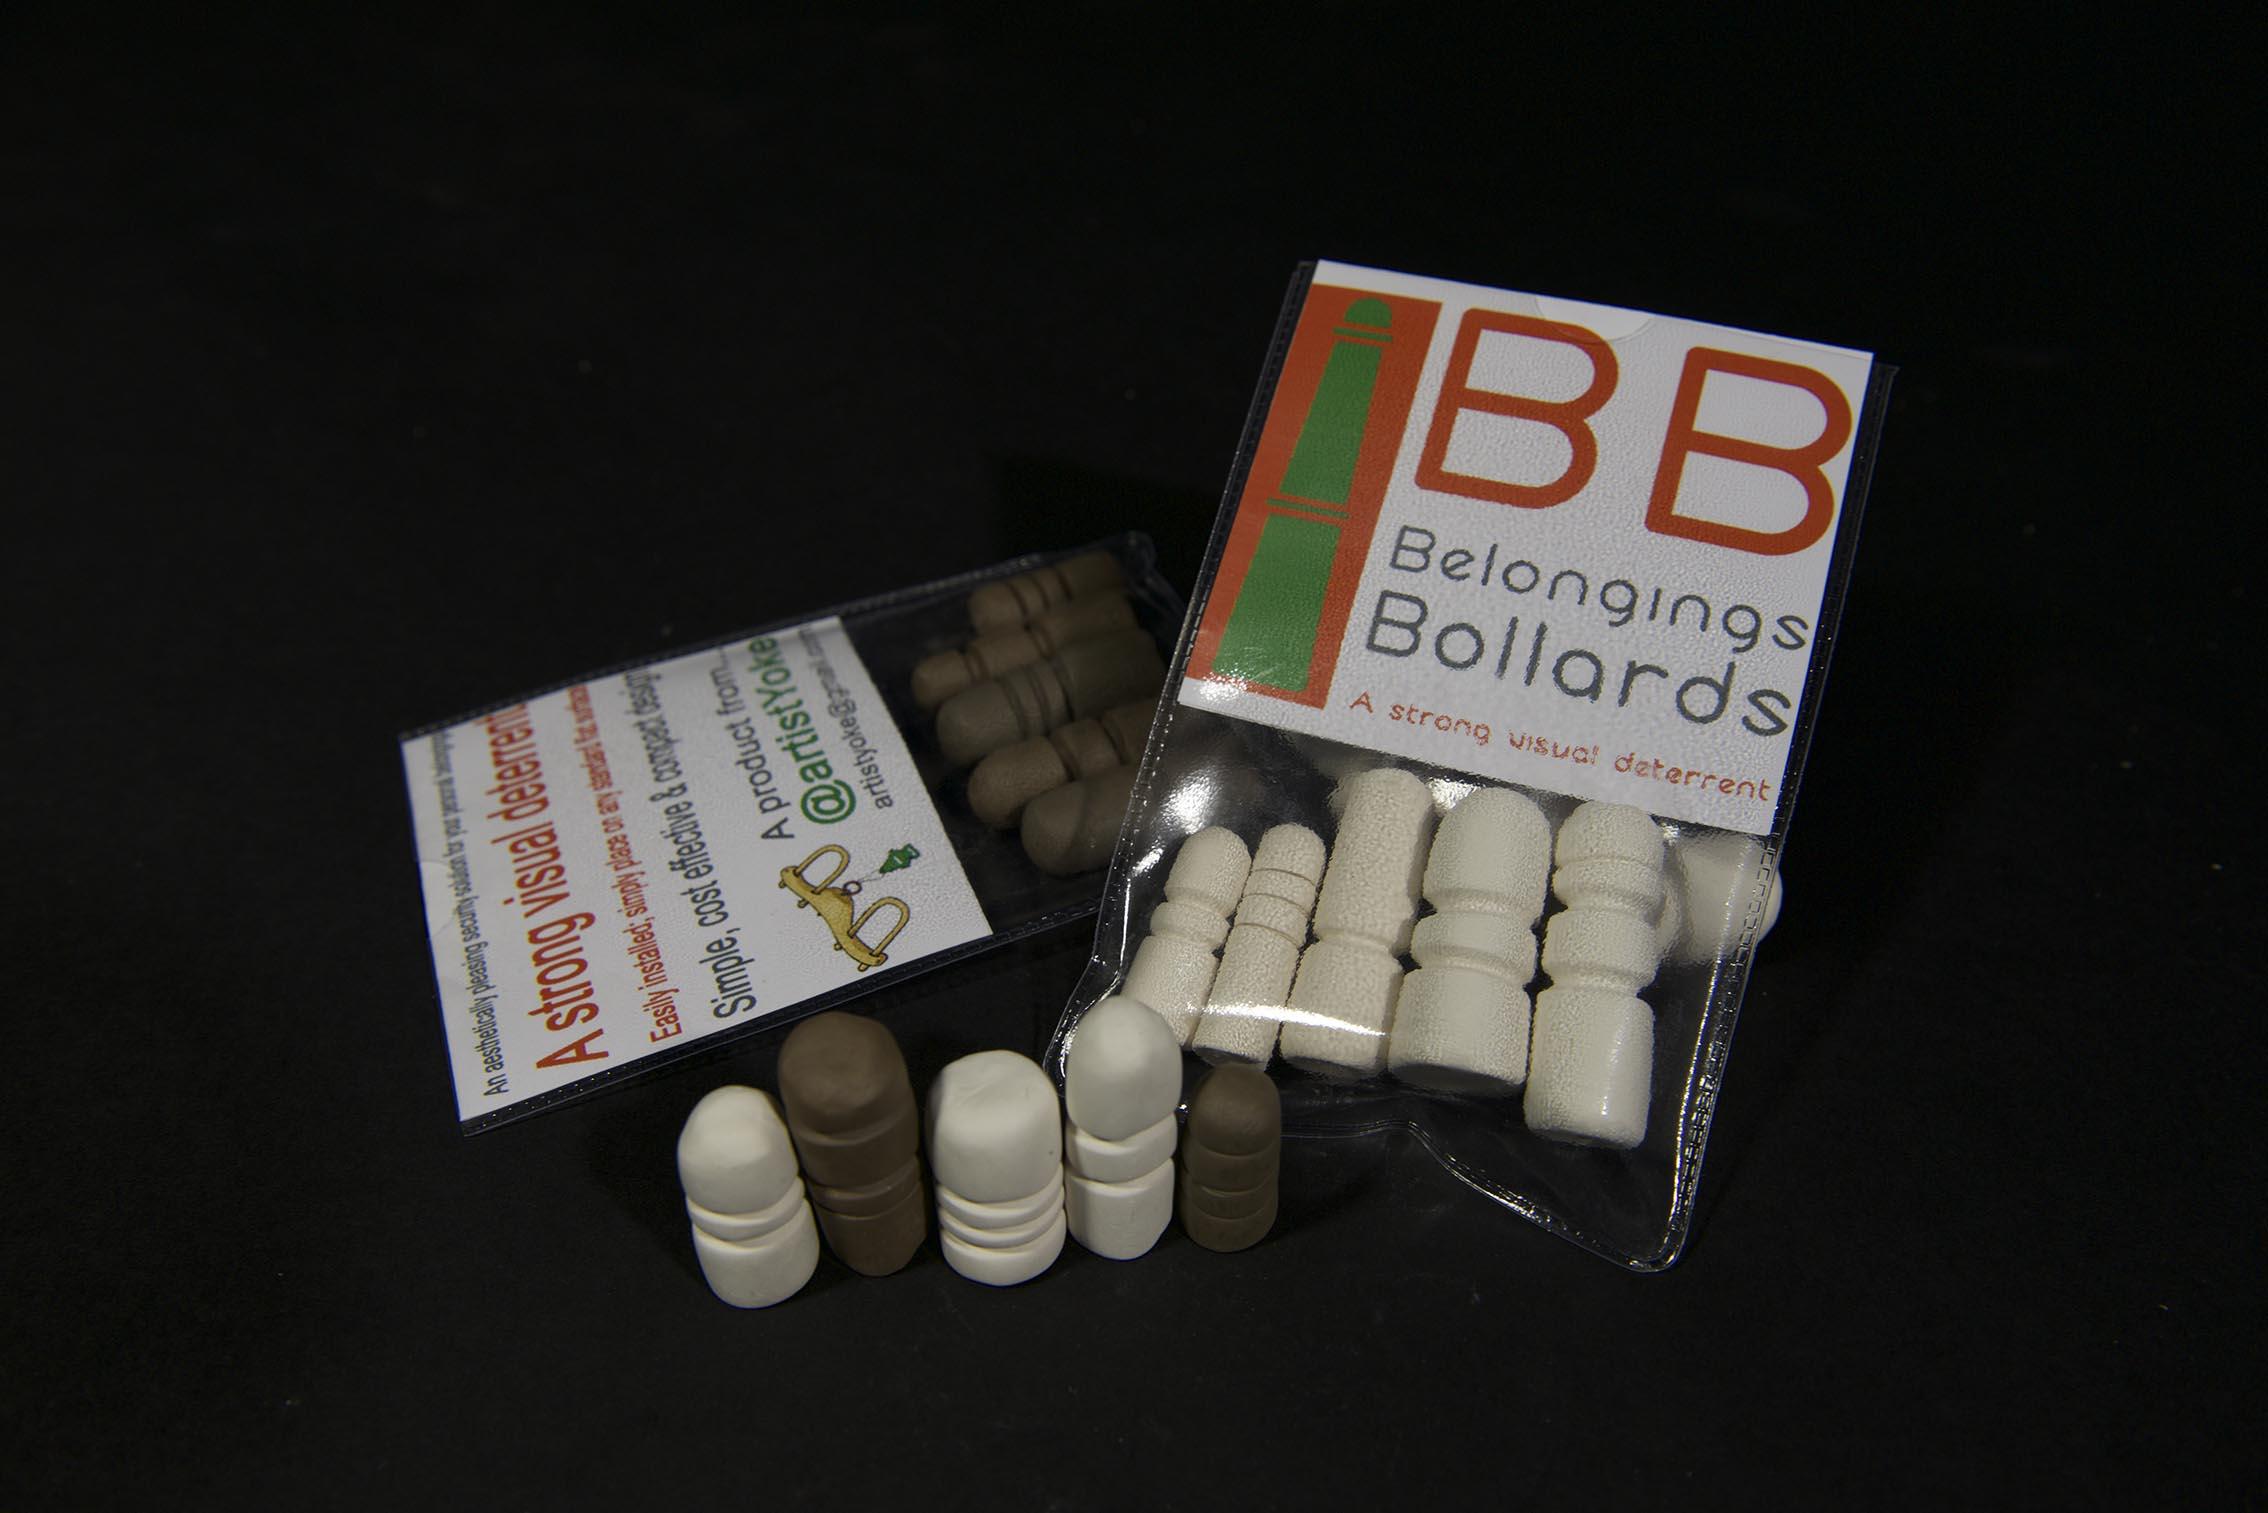 belongings bollards